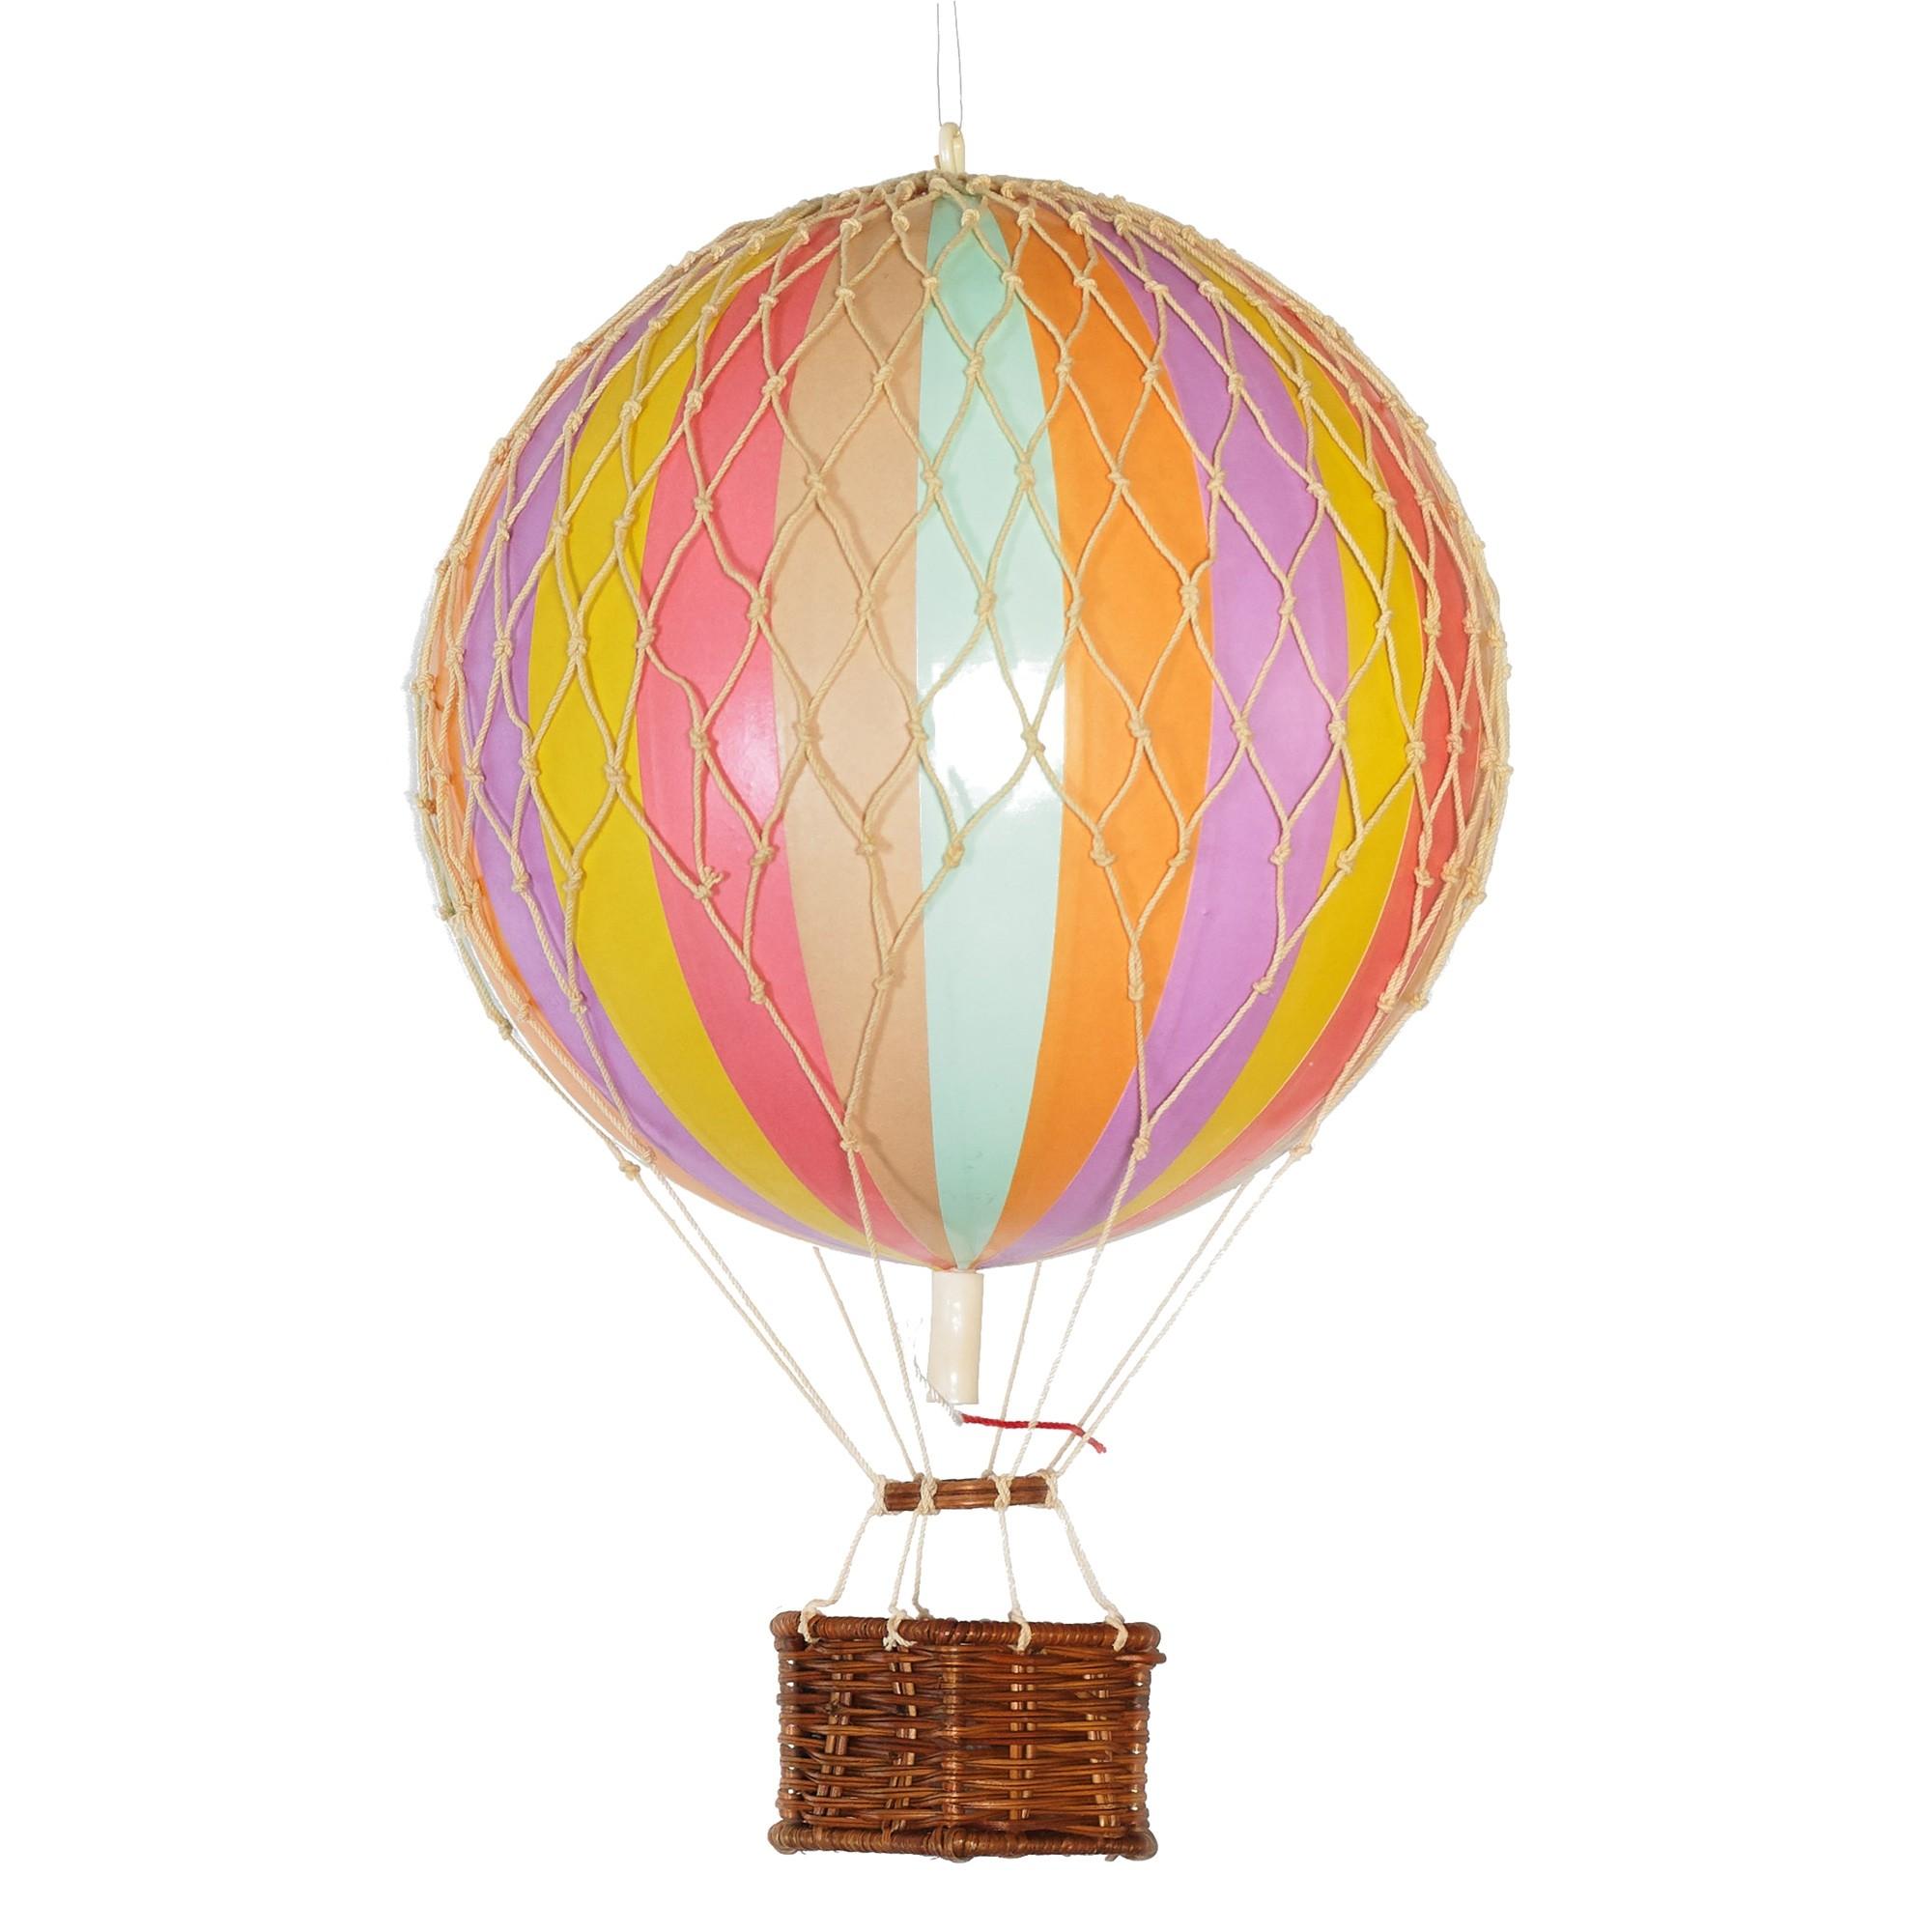 Floating The Skies Hot Air Balloon Model, Pastel Rainbow